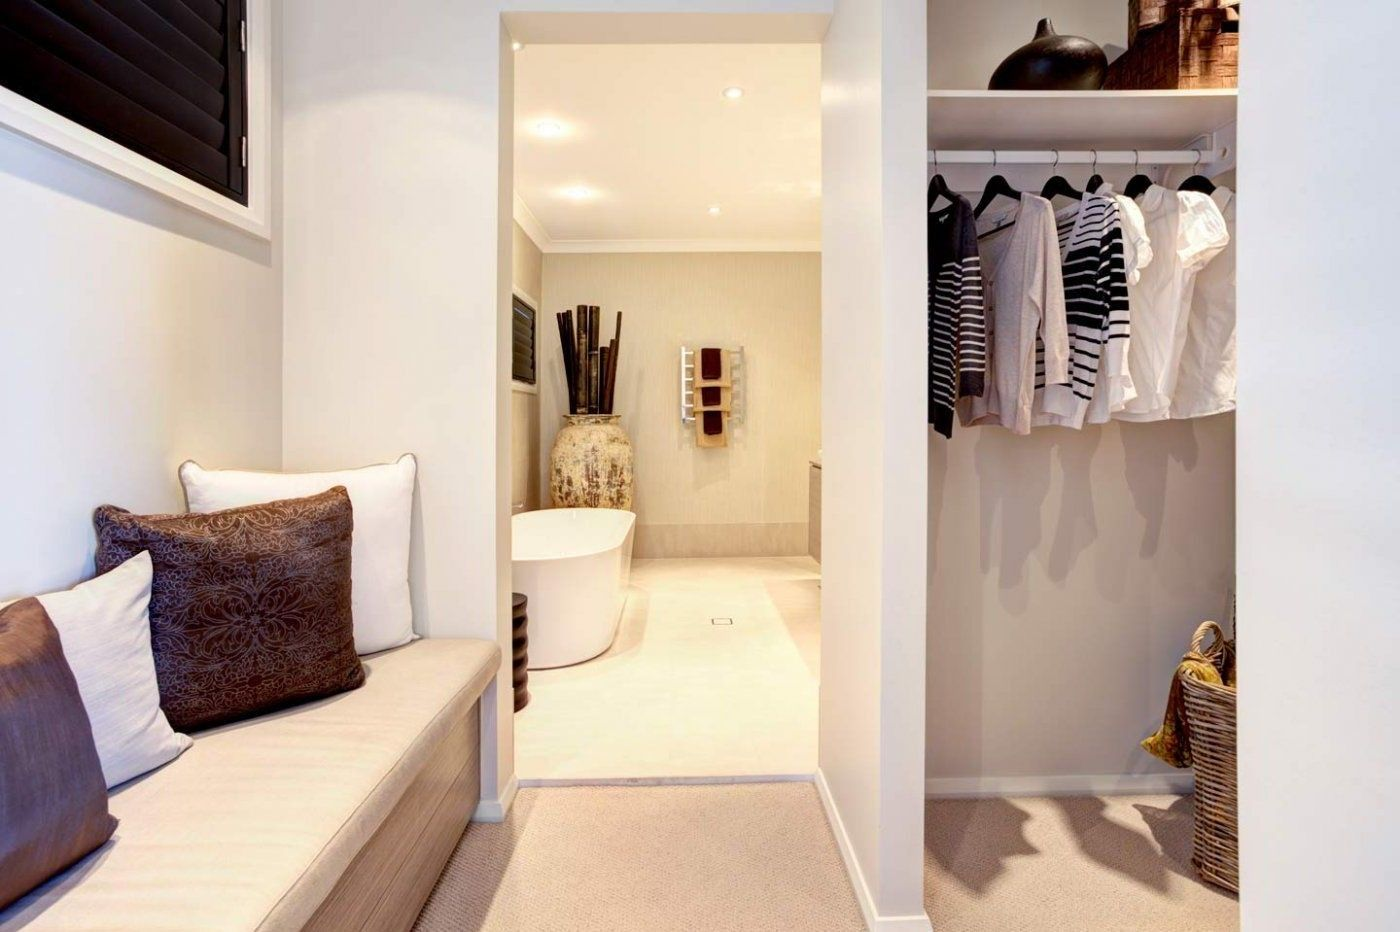 Master bedroom ensuite ideas   Master Bedroom With Ensuite And Walk In Wardrobe  Bedroom